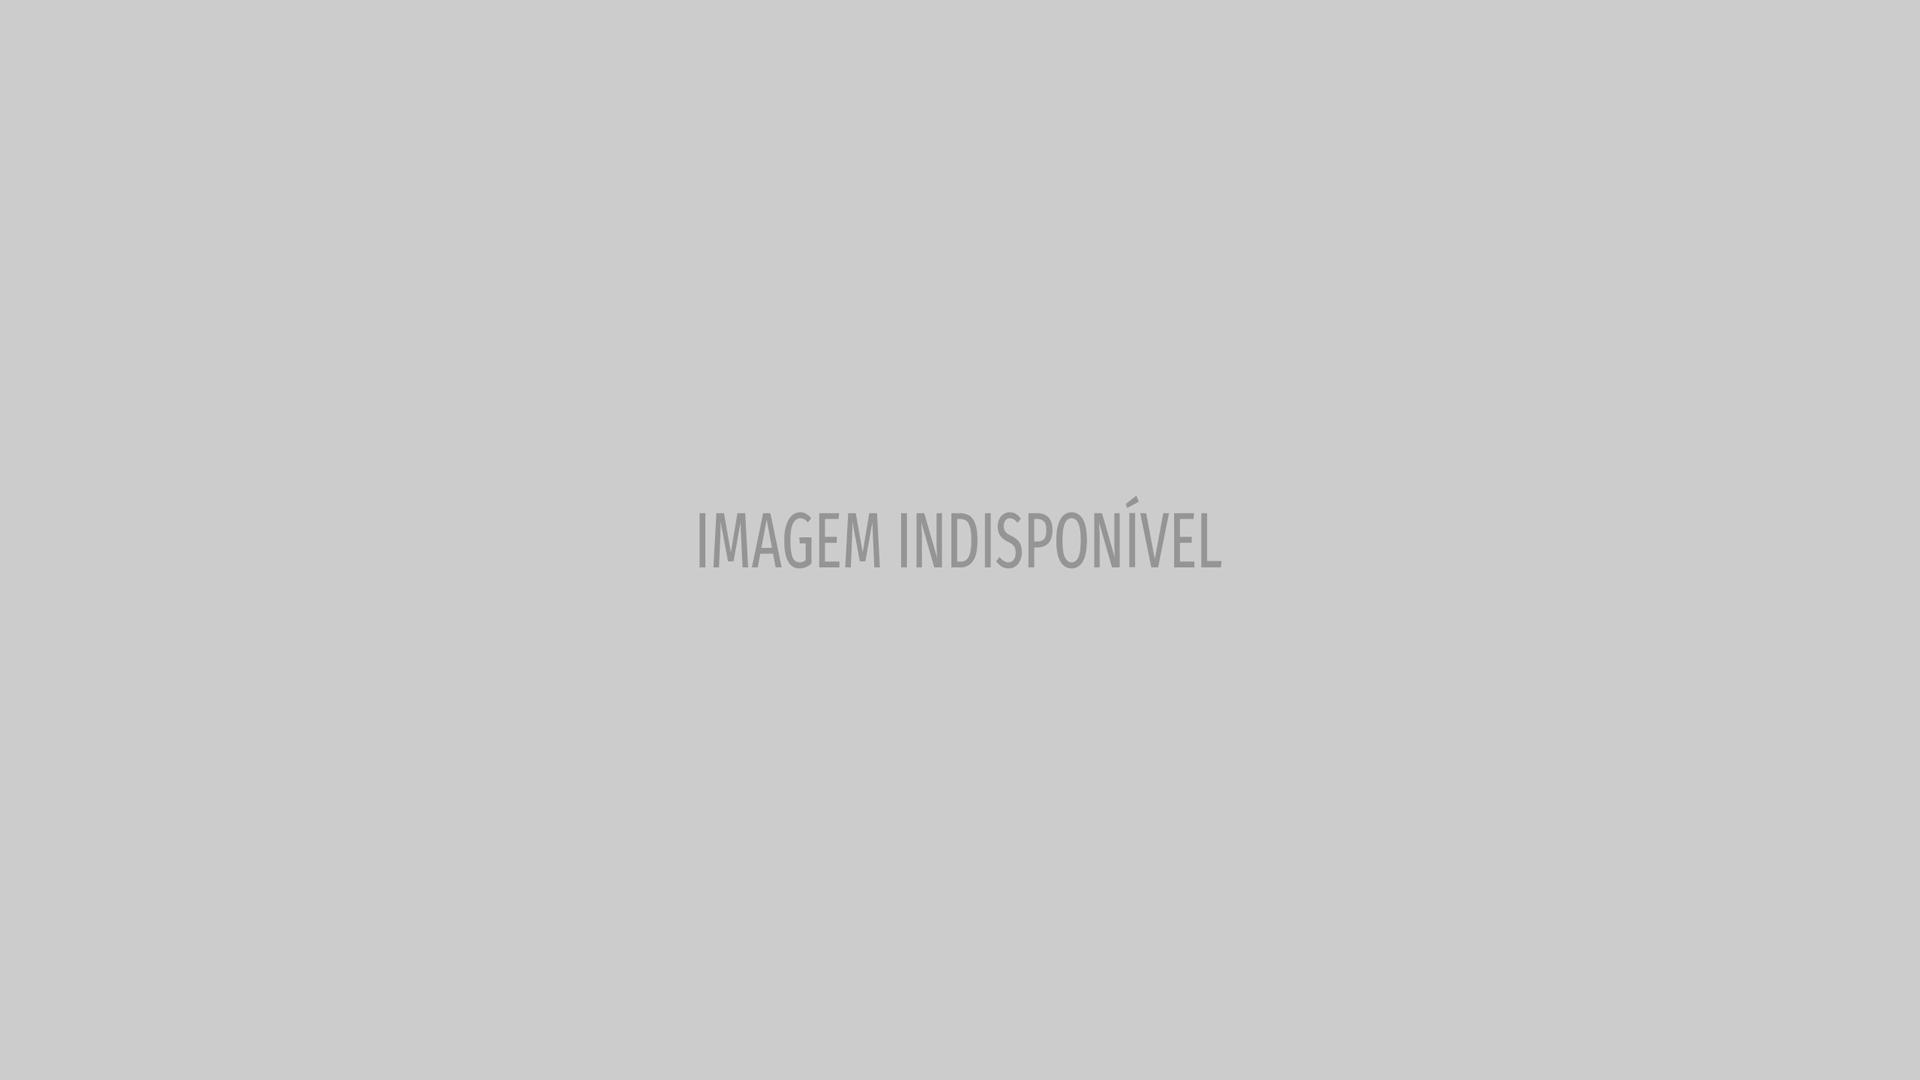 Leonor Poeiras fará debate com José Eduardo Moniz sobre programa polémico